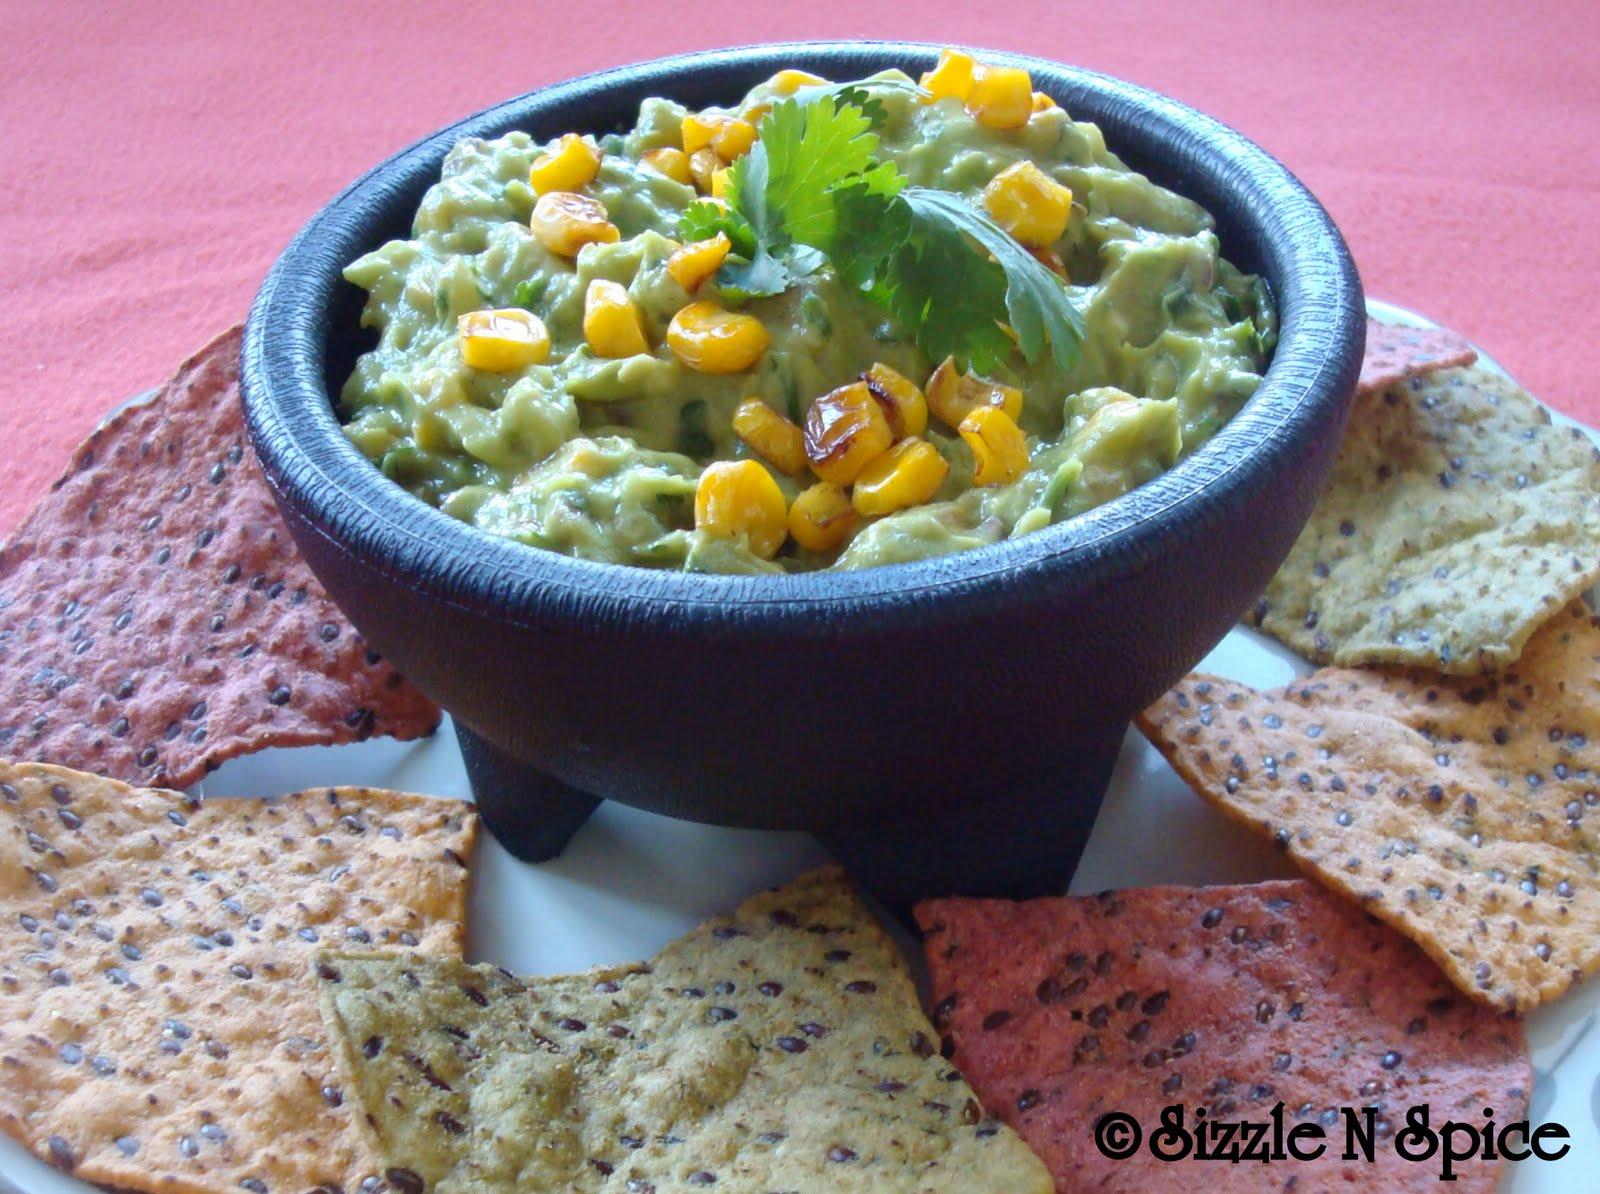 Sizzle N Spice: Roasted Corn Guacamole